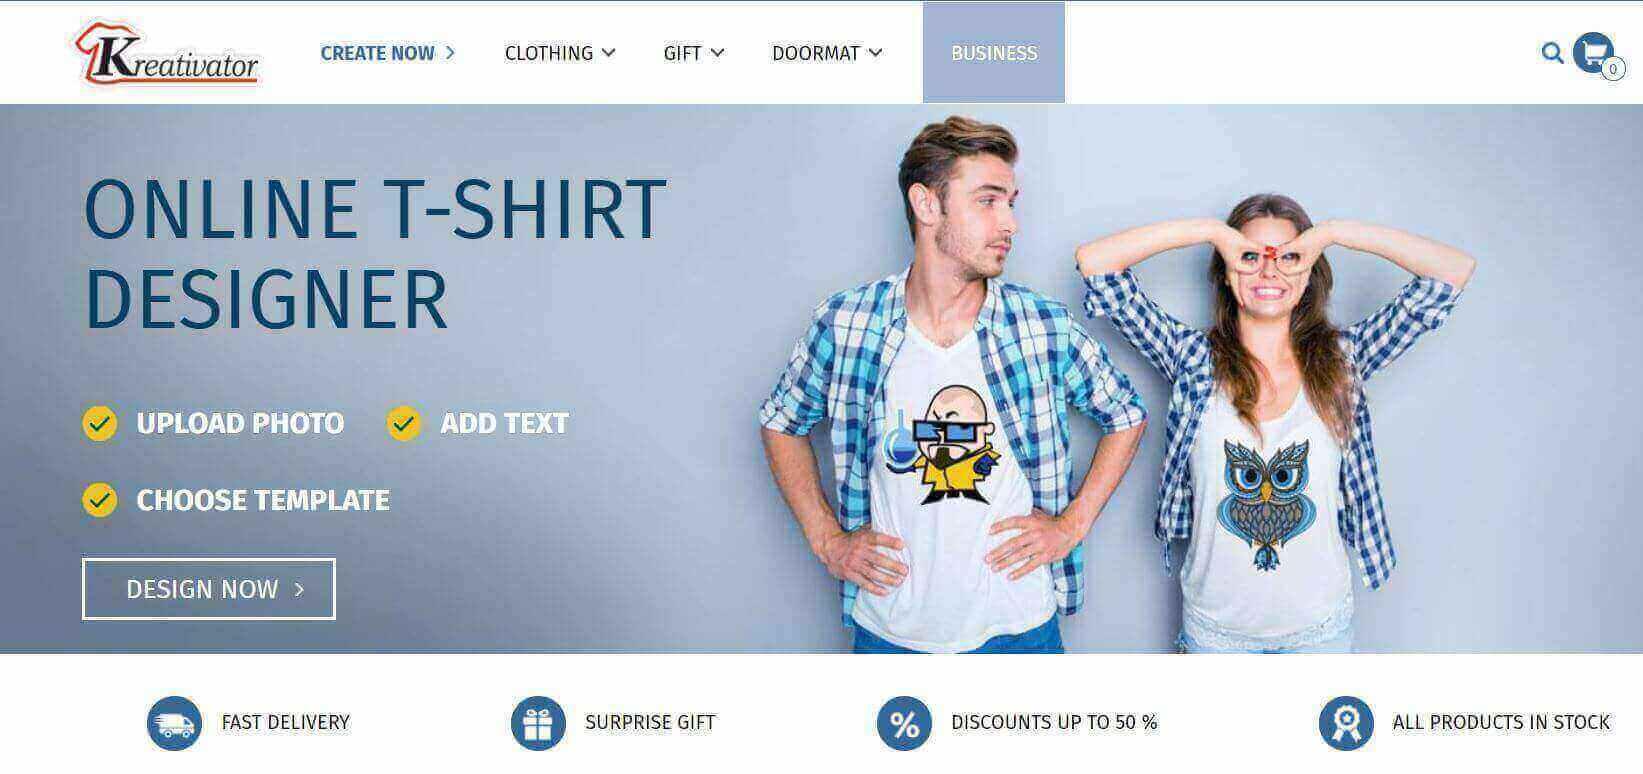 Online T-shirt designer Kreativator